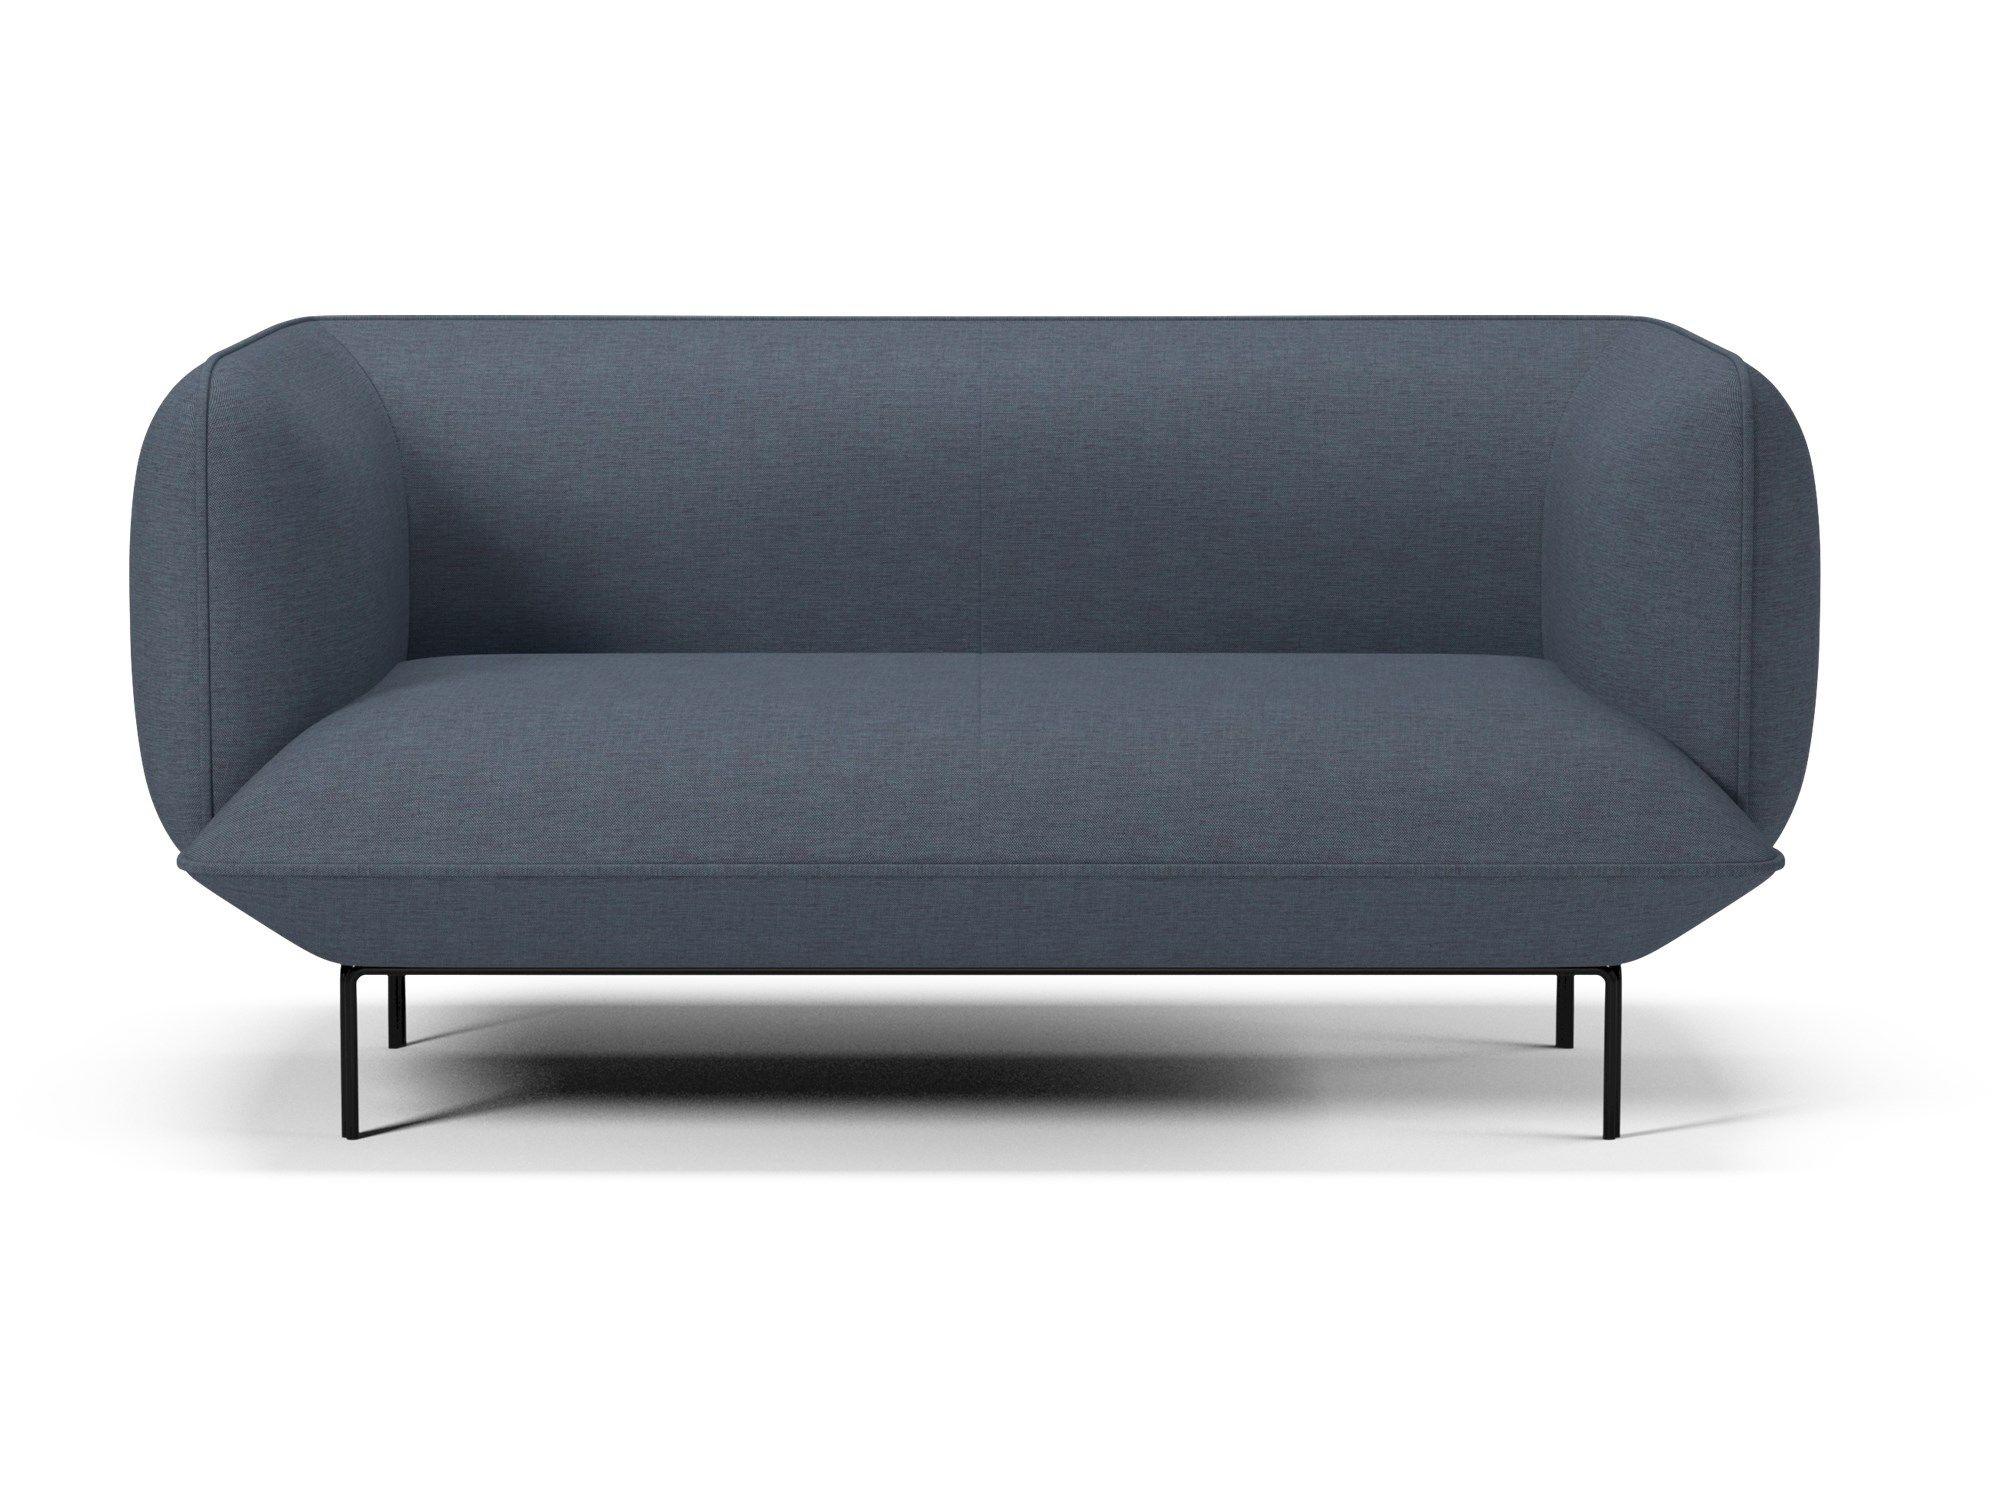 New Sofas Arrivals Sofa Sofa Design Contemporary Furniture Design